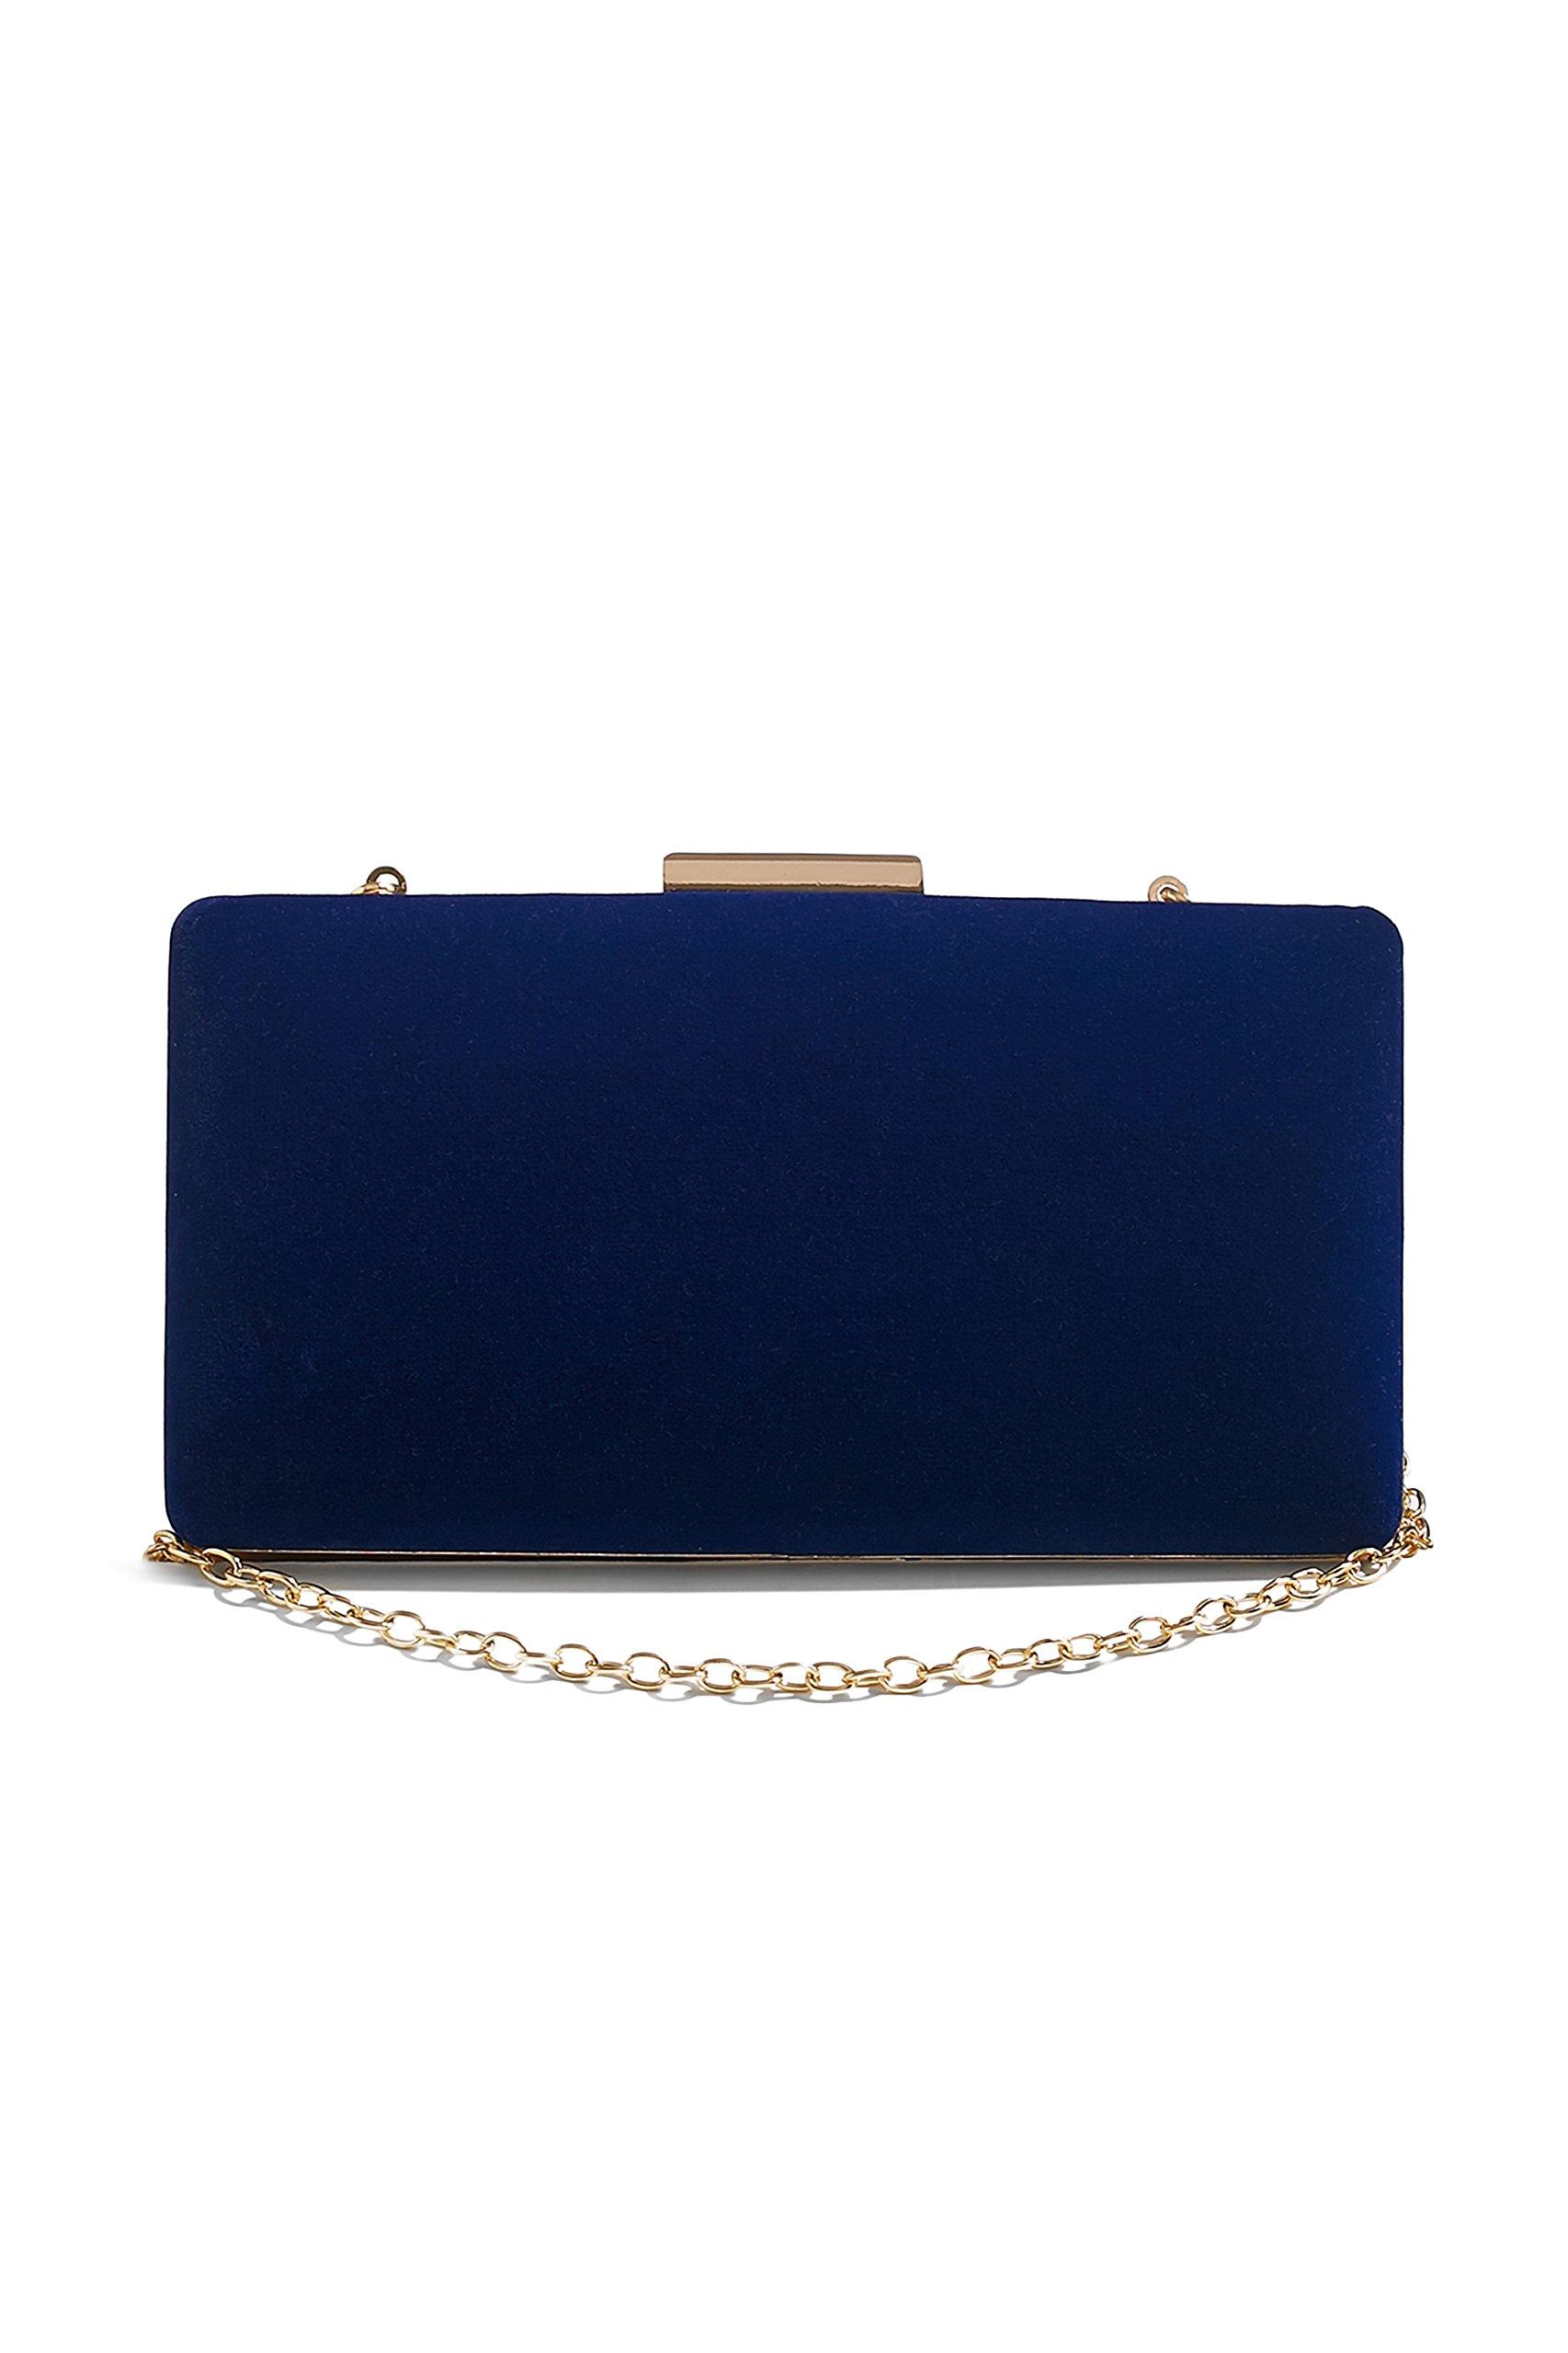 Women Velvet Clutch Purse Evening Bag Hard Box Vintage Handbag With Chain Strap (oxford blue)